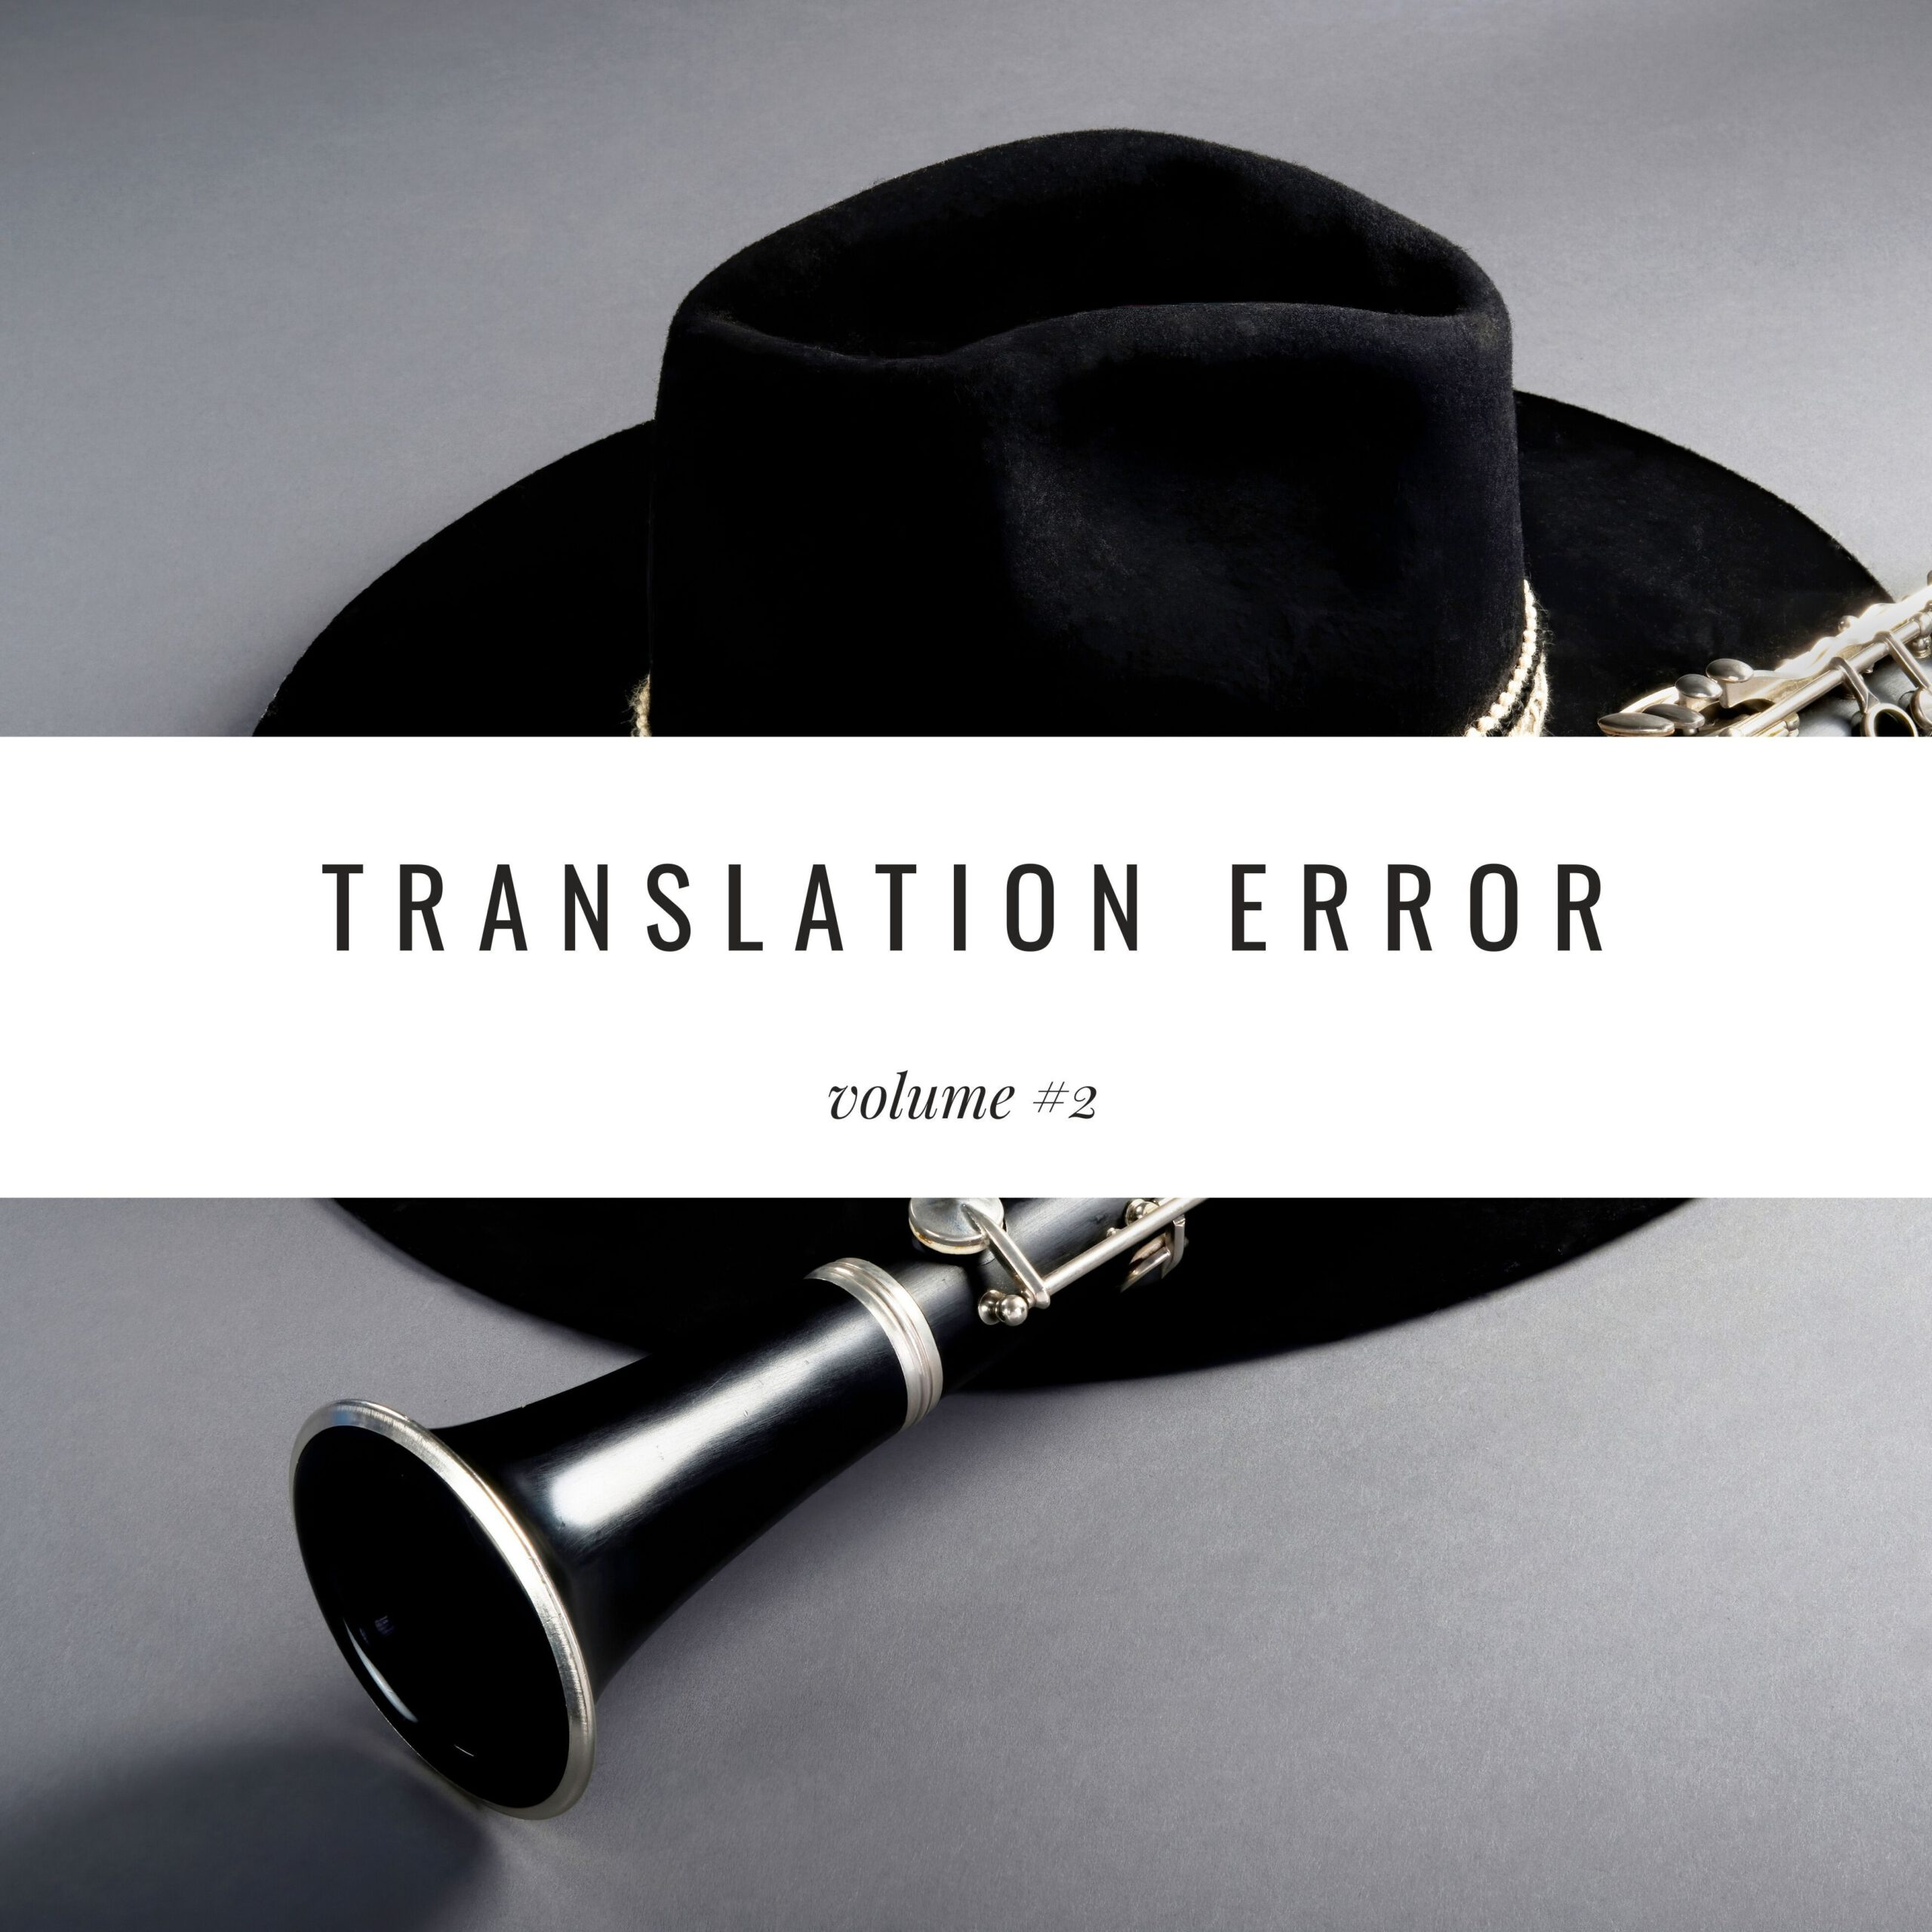 Translation Error, Vol. 2